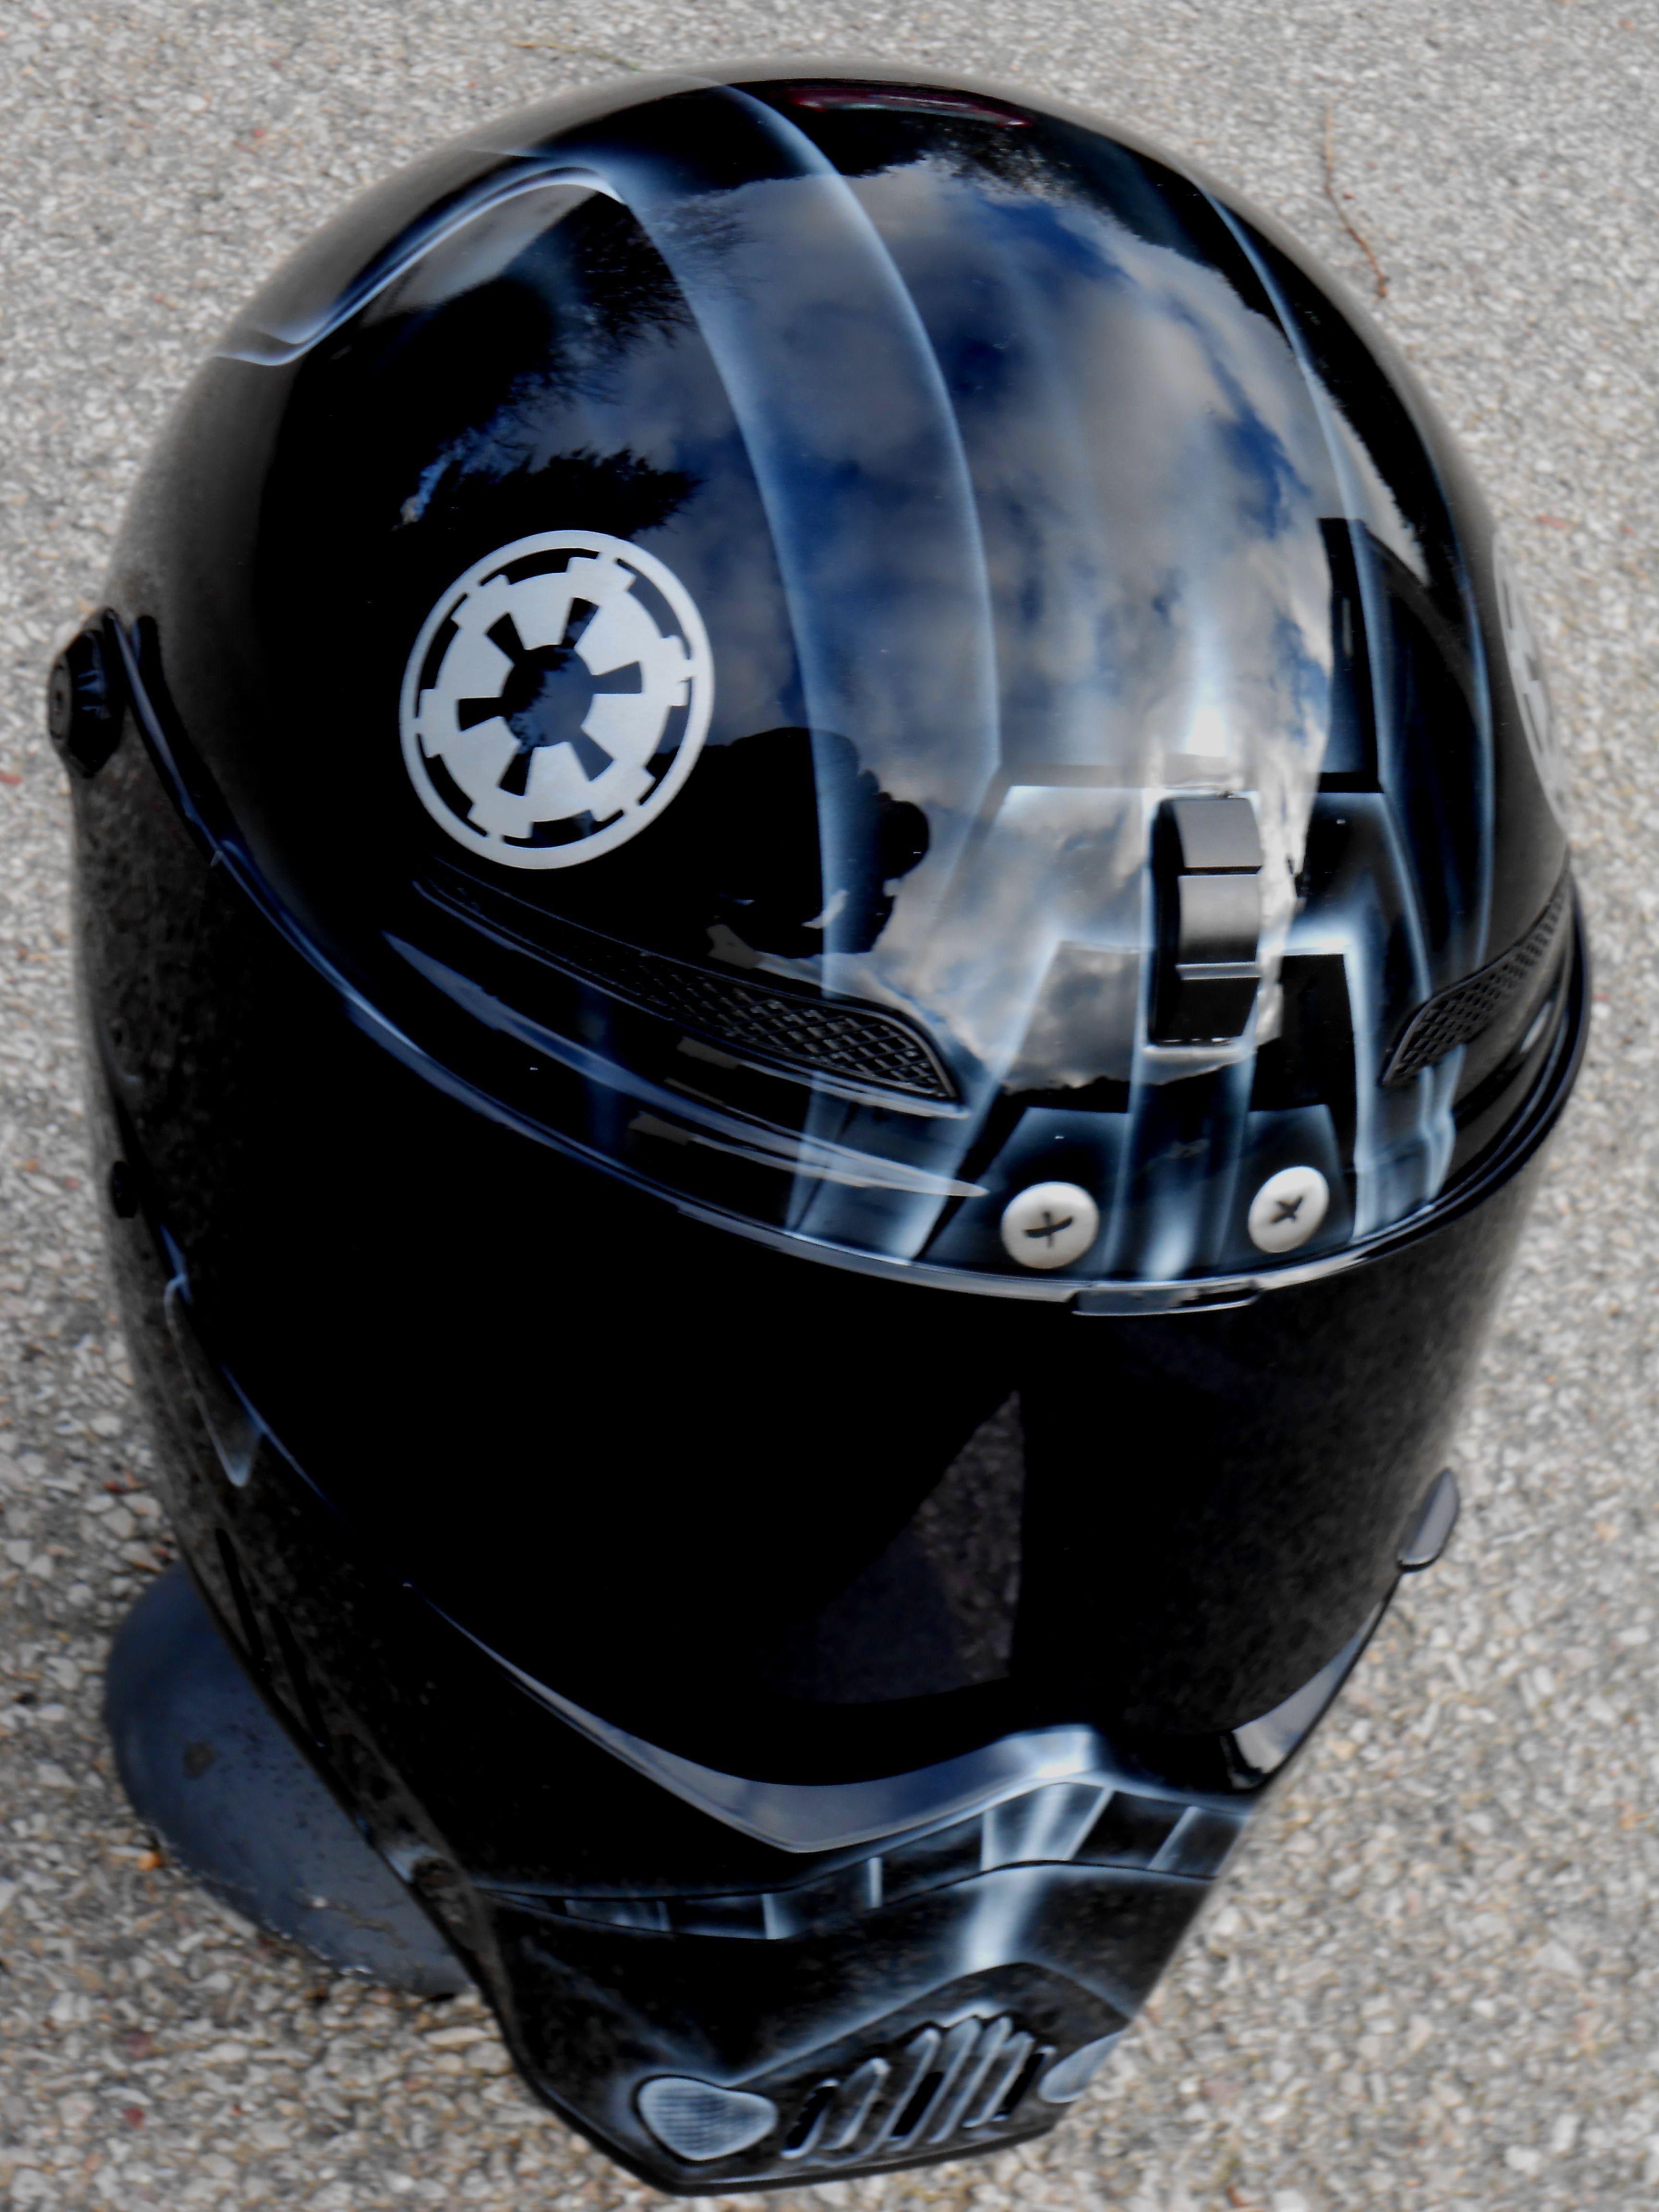 bandit helmet airbrush starwars, tie fighter pilot ... Tie Fighter Pilot Helmet